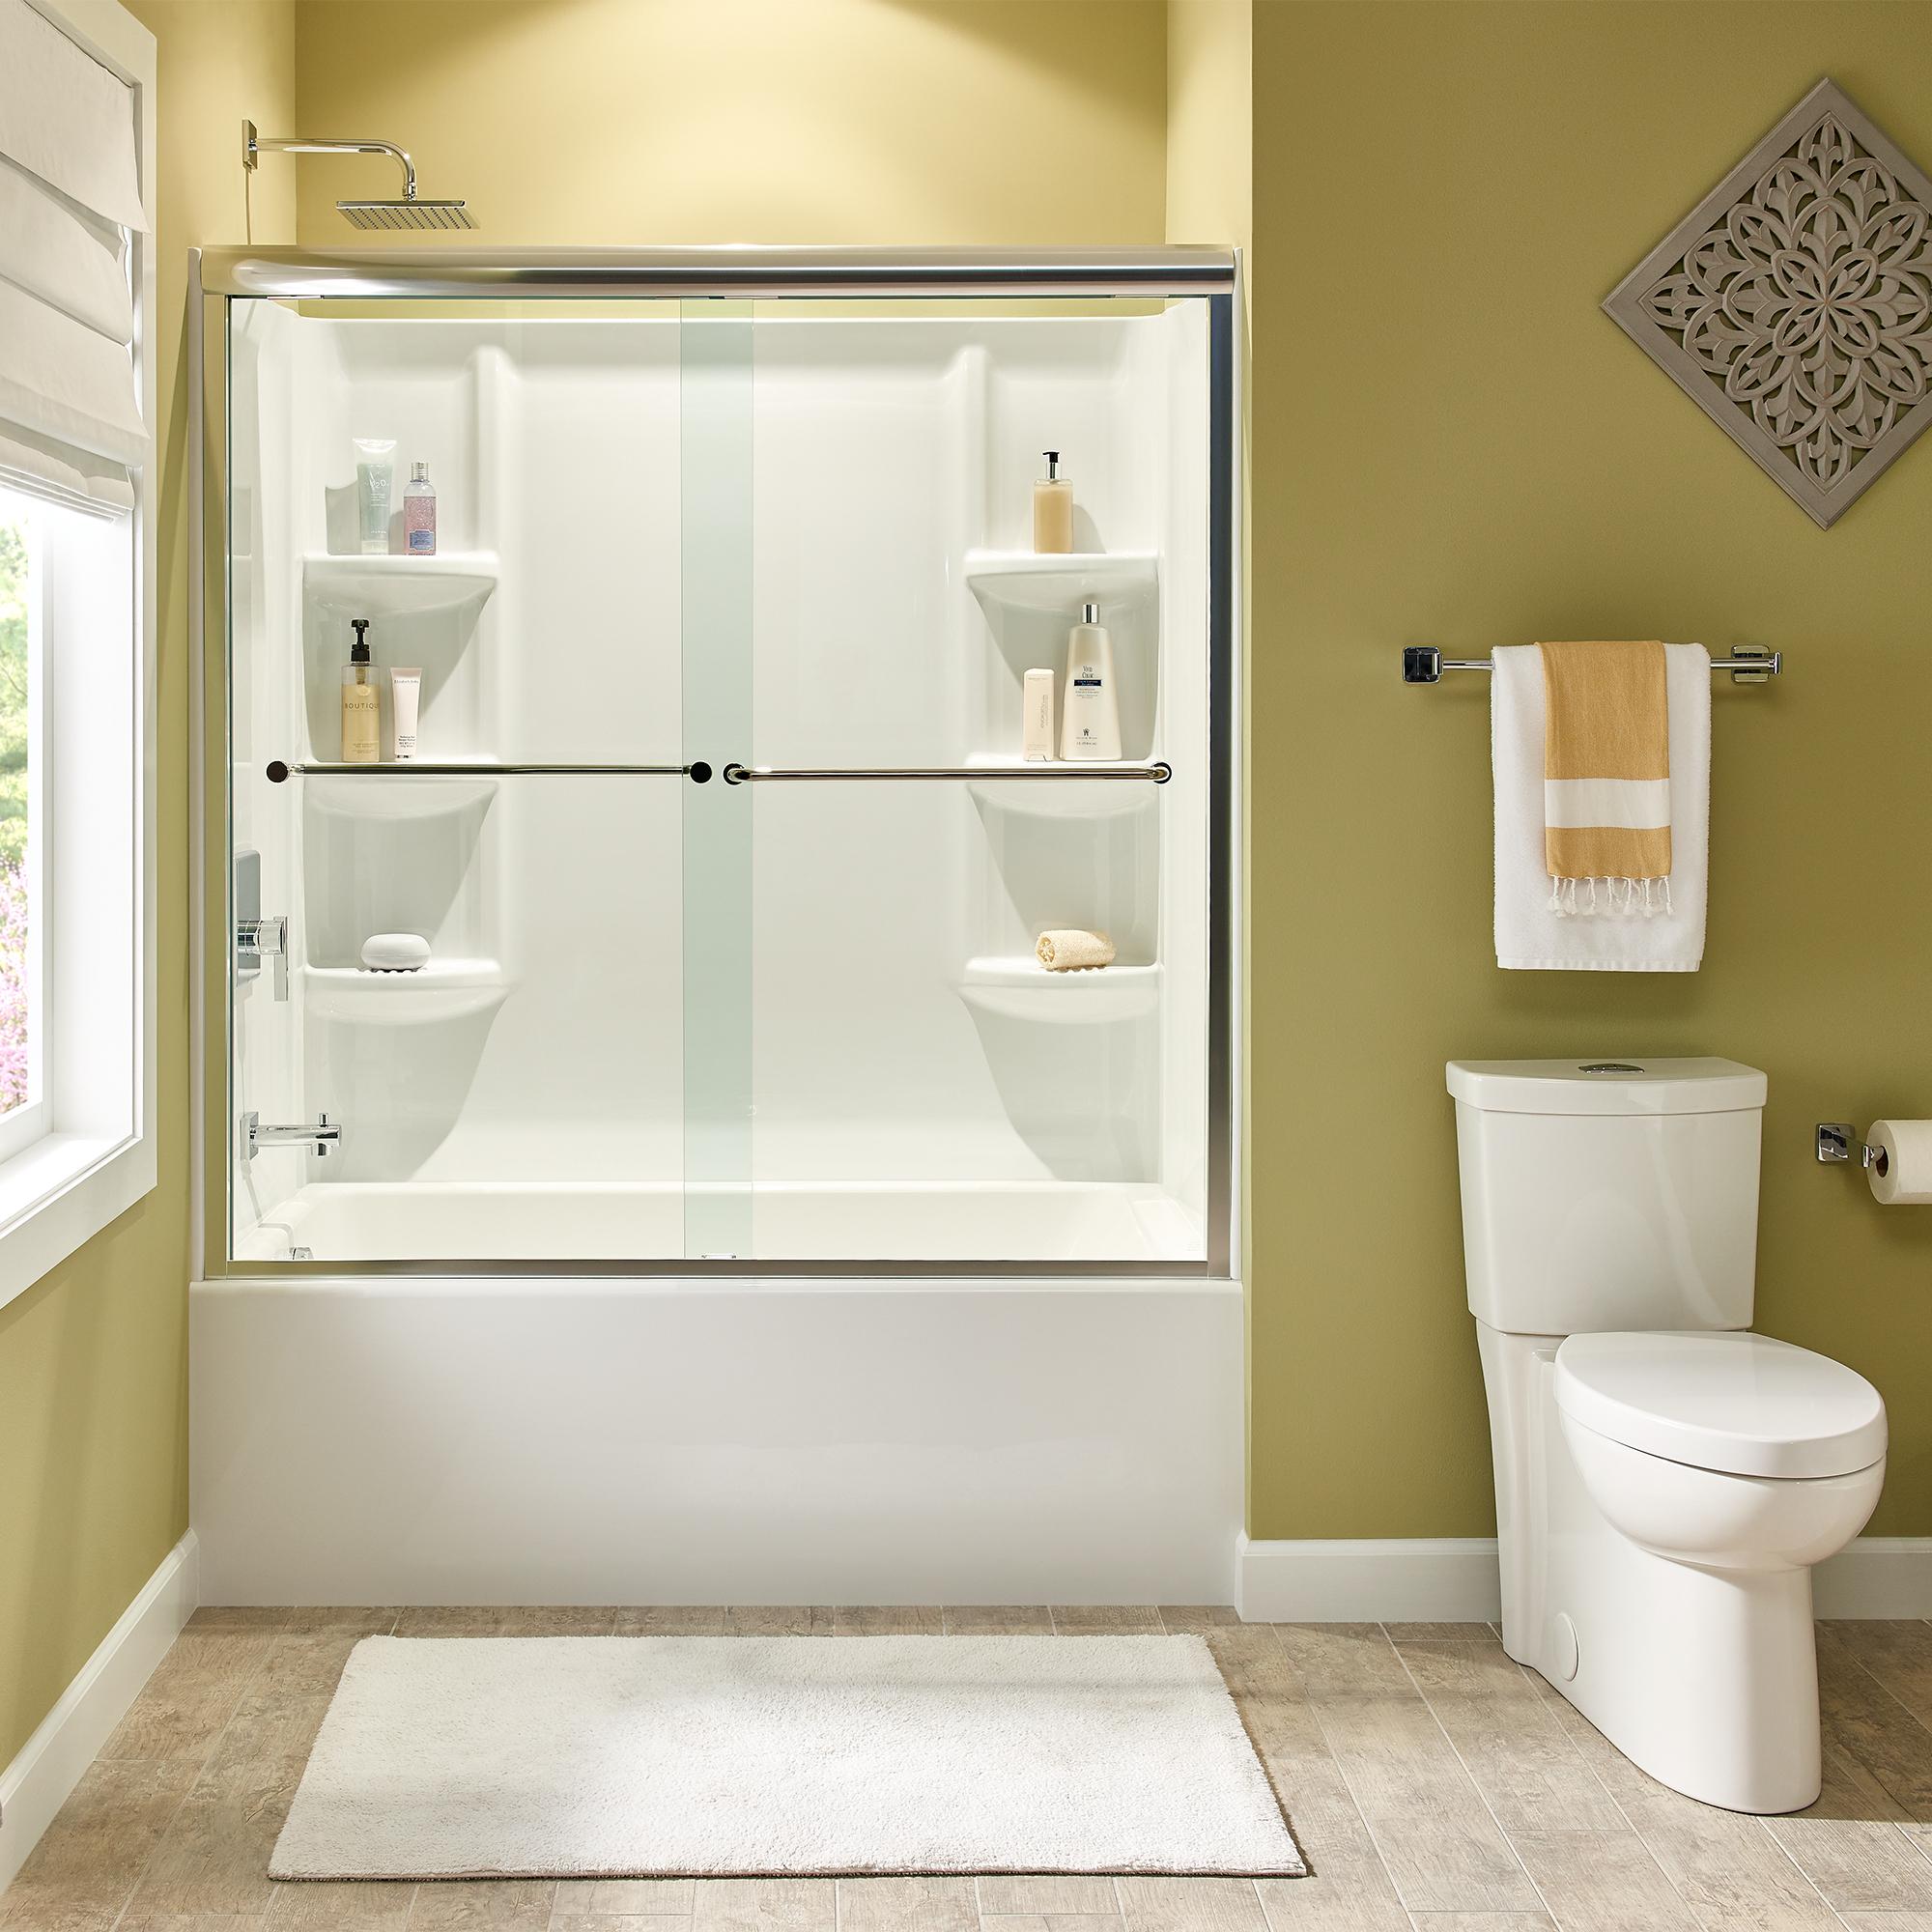 Tub Shower Walls American Standard regarding measurements 2000 X 2000